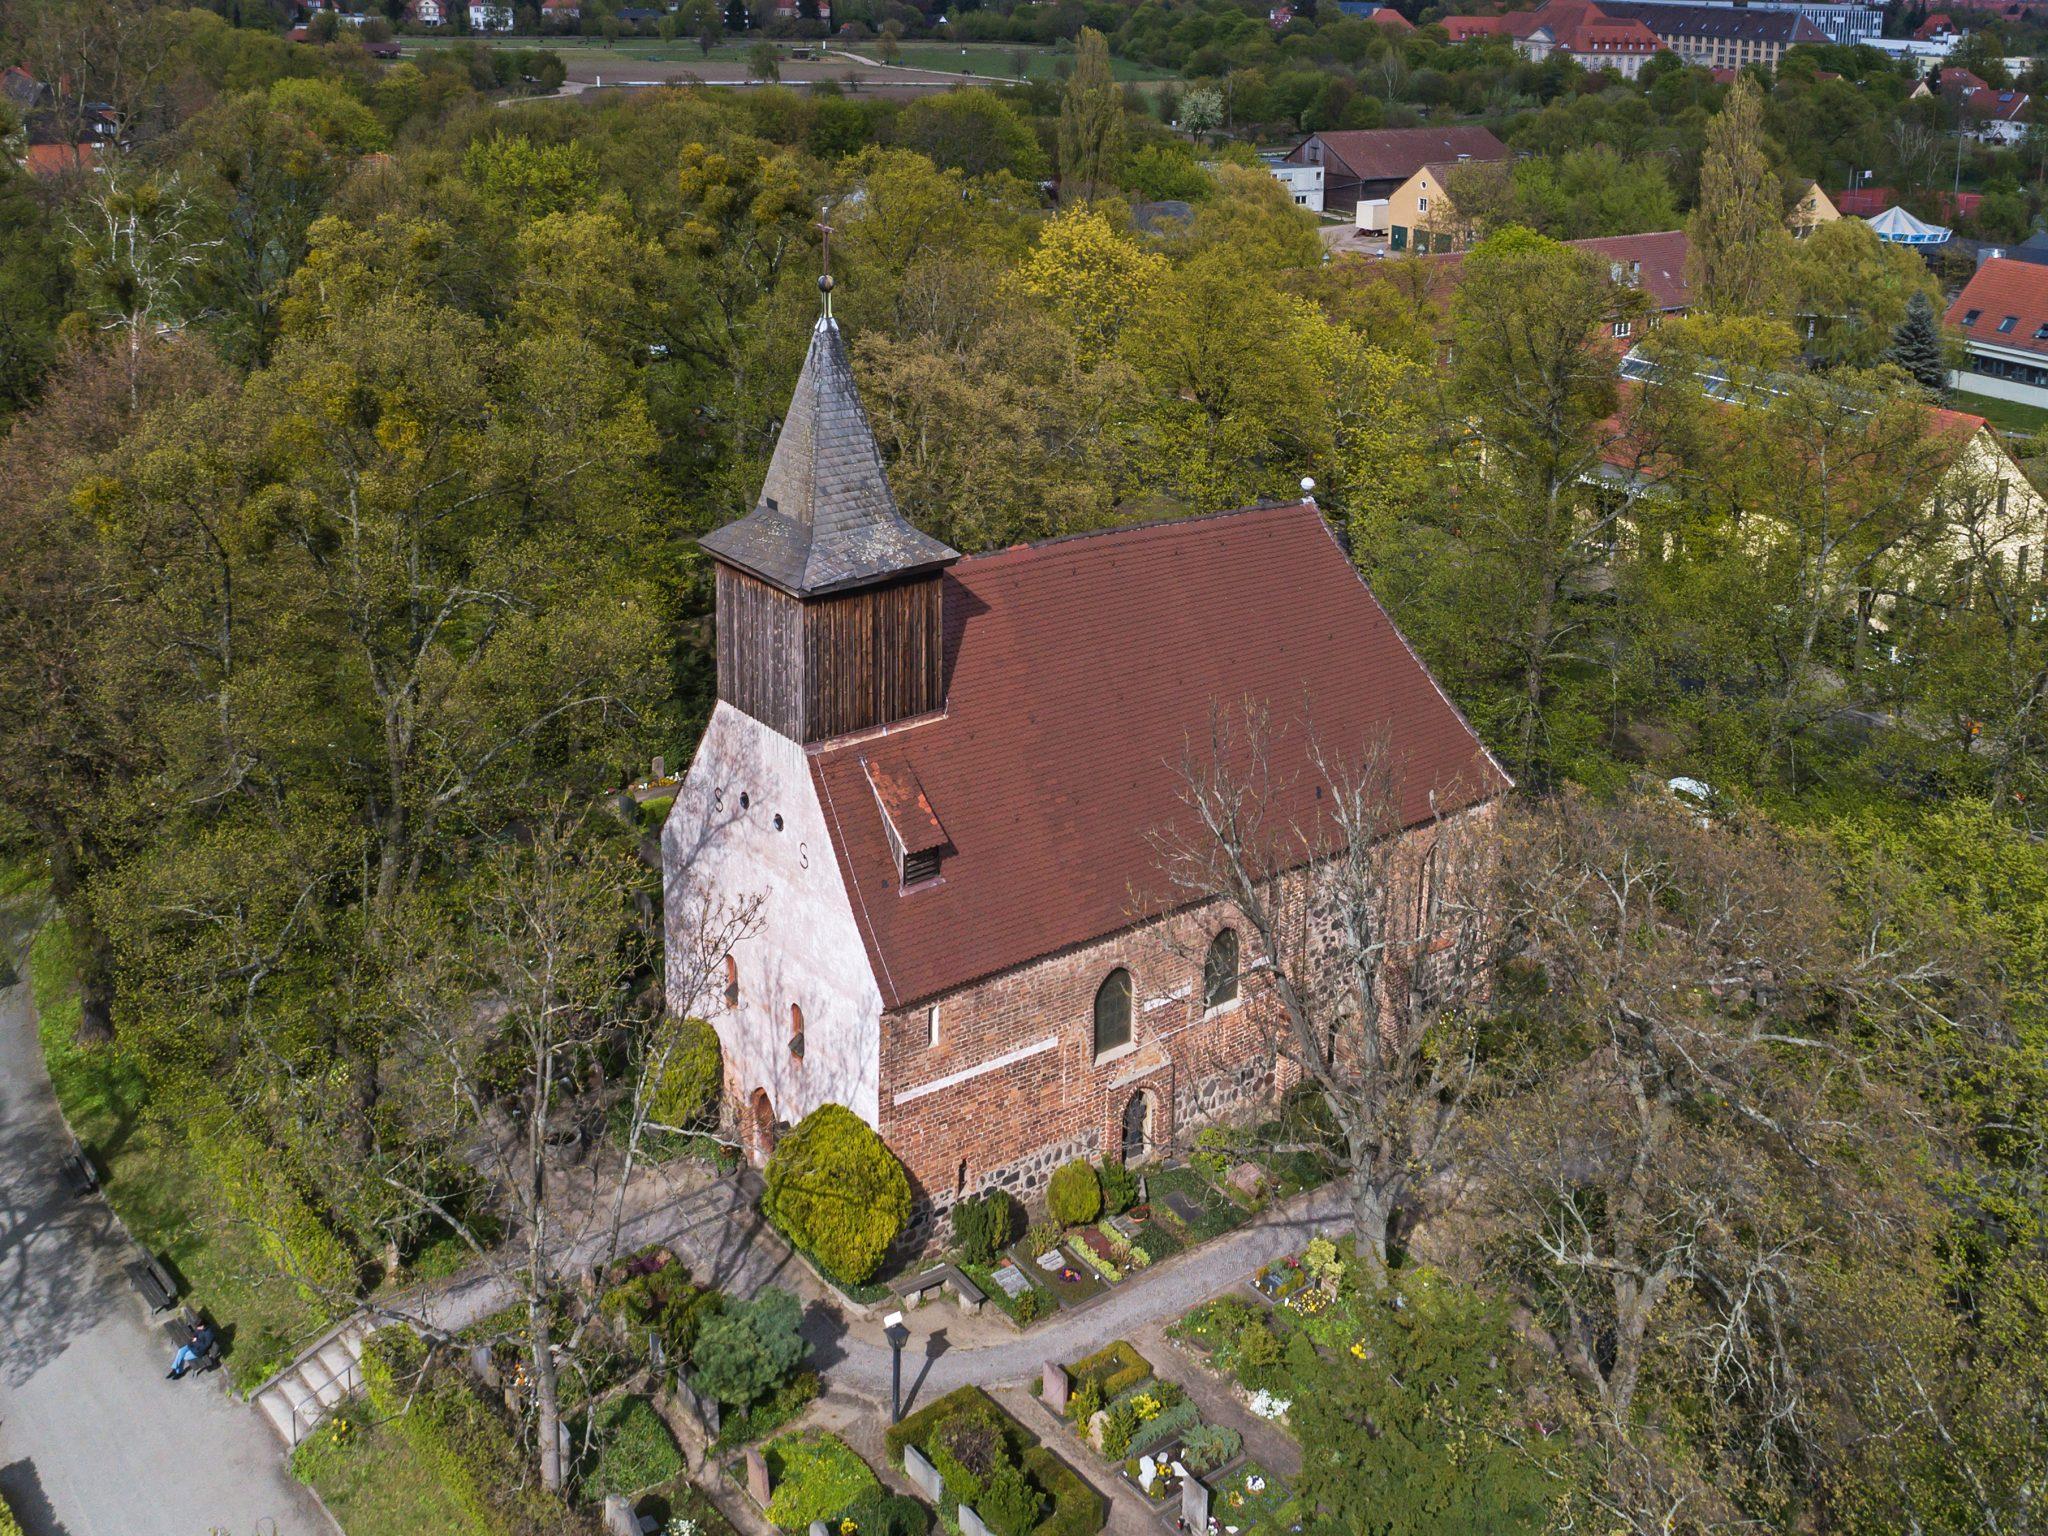 Dorfkirche Dahlem (St.-Annen-Kirche)